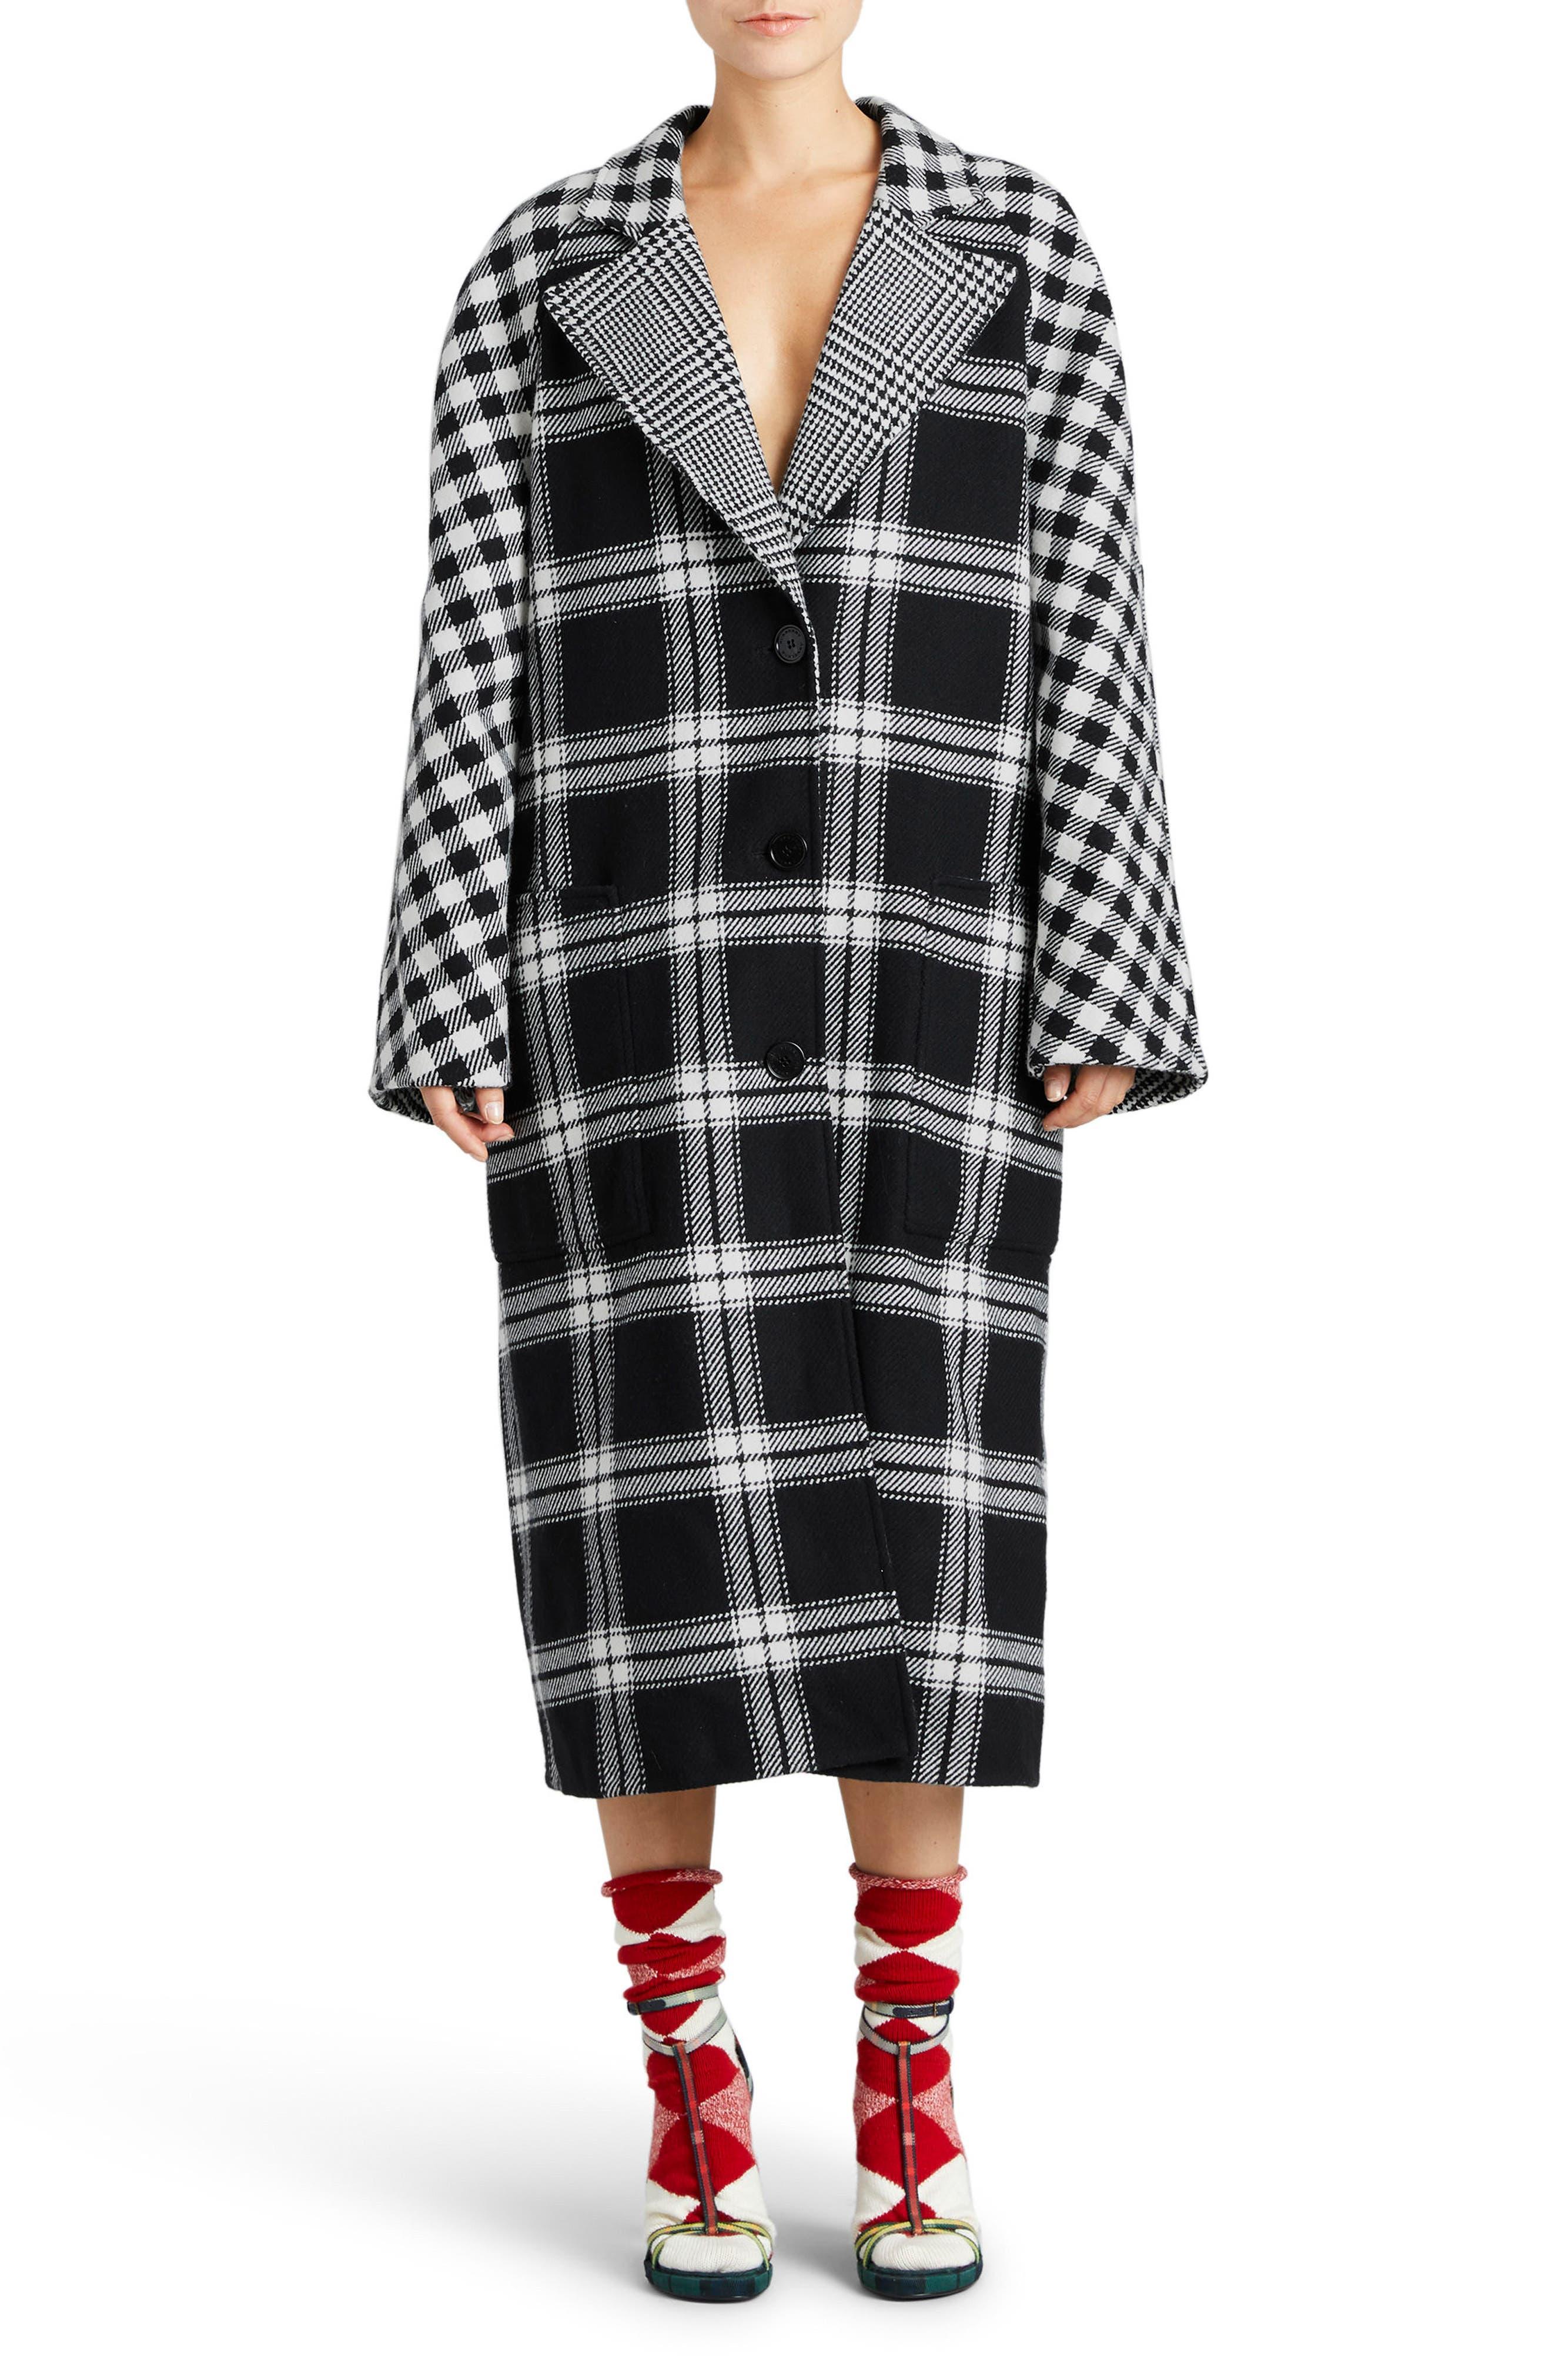 Burberry Tartan Wool & Cashmere Reversible Overcoat